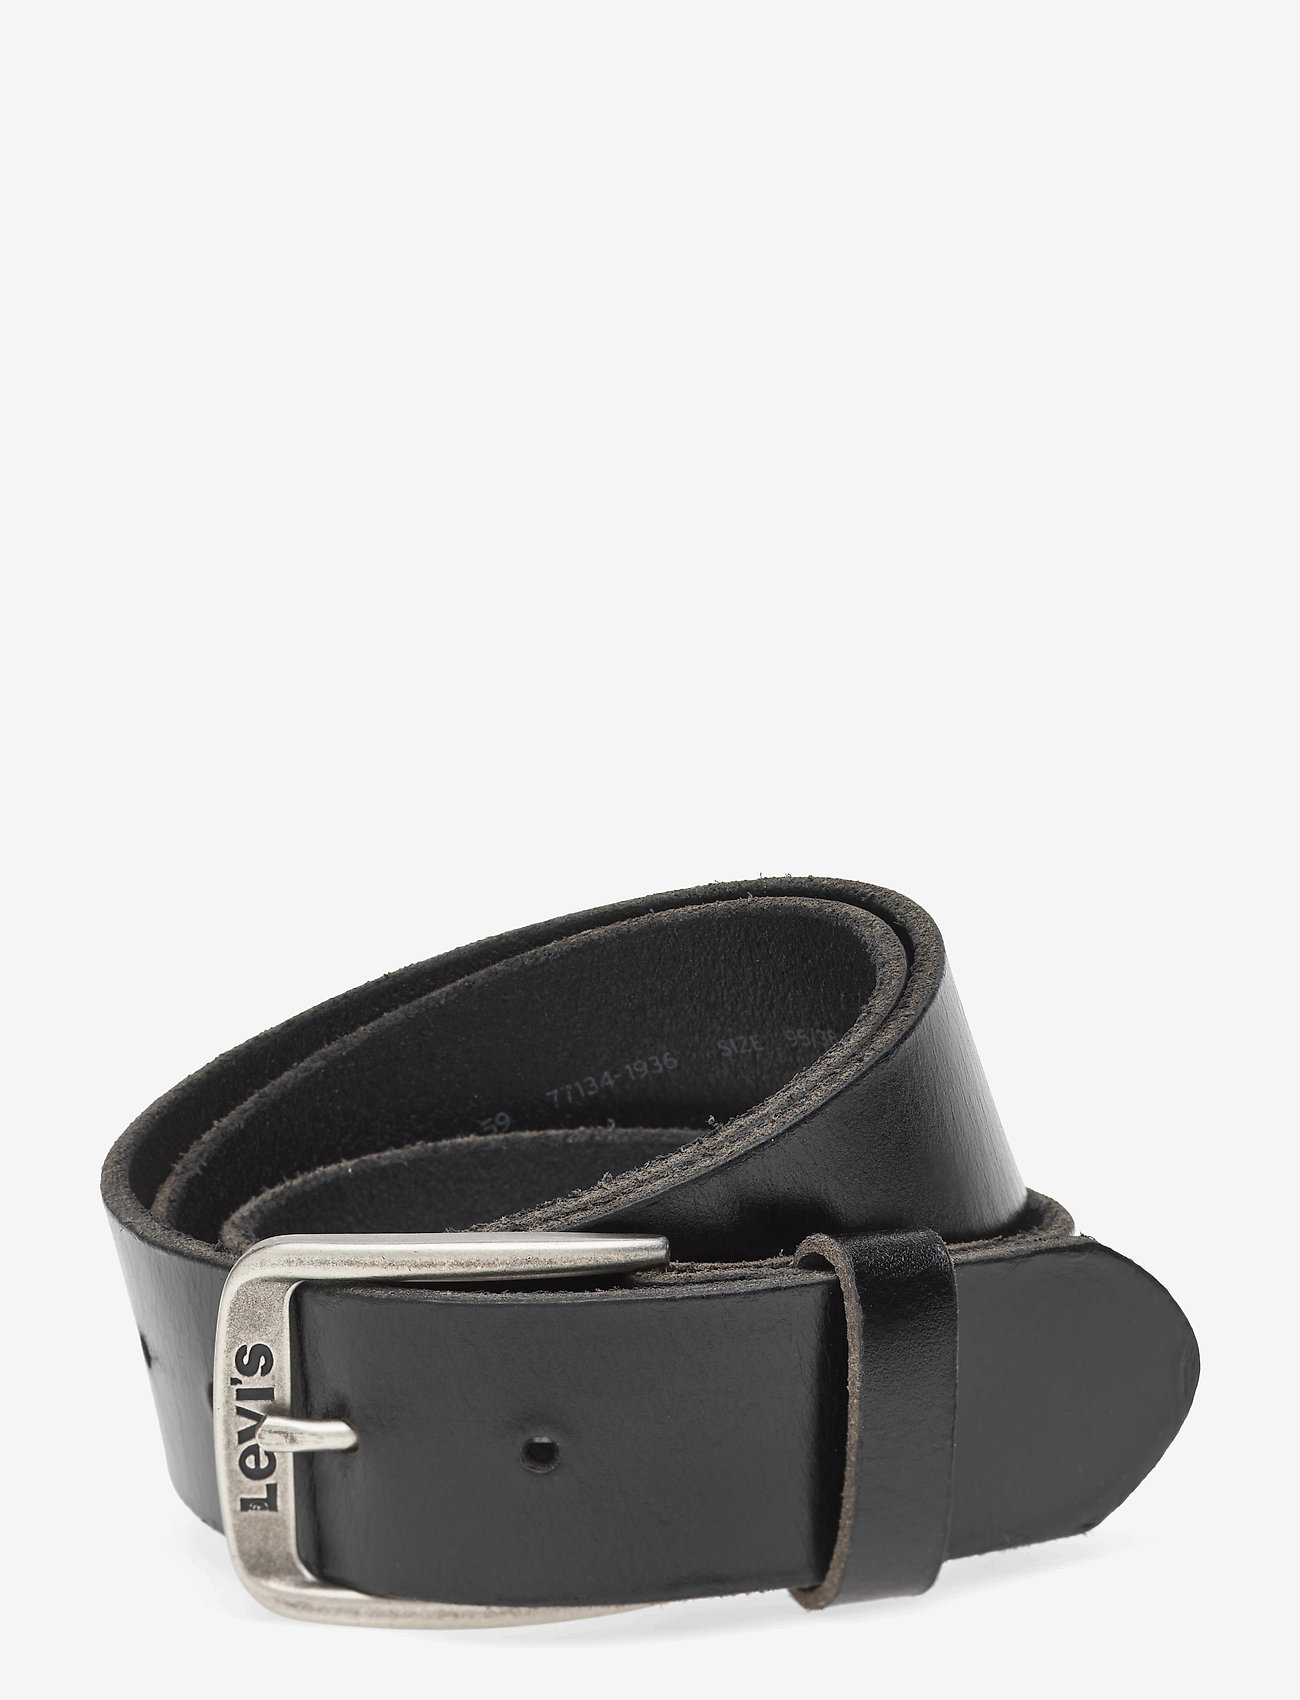 Levi's Footwear & Acc - ALTURAS - ceintures classiques - regular black - 0